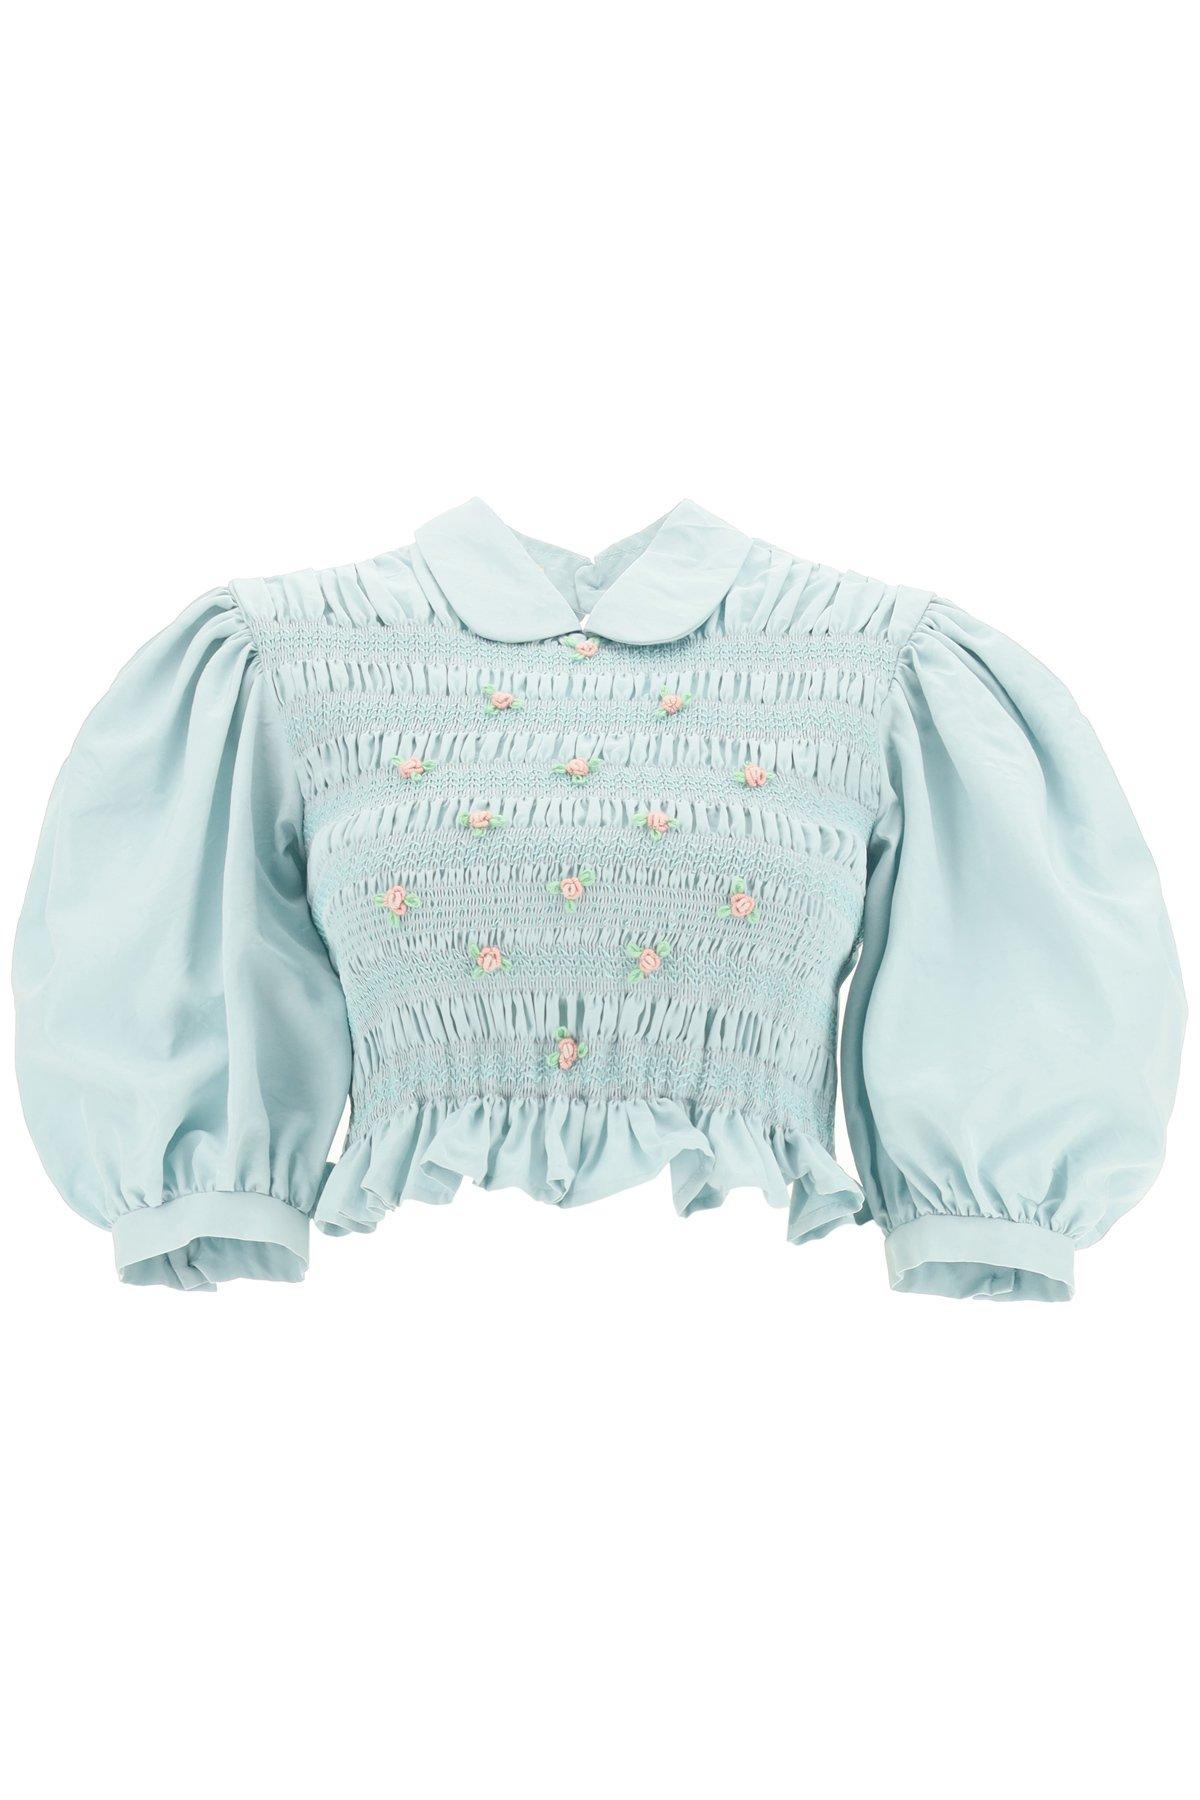 Miu miu faille top with floral applications